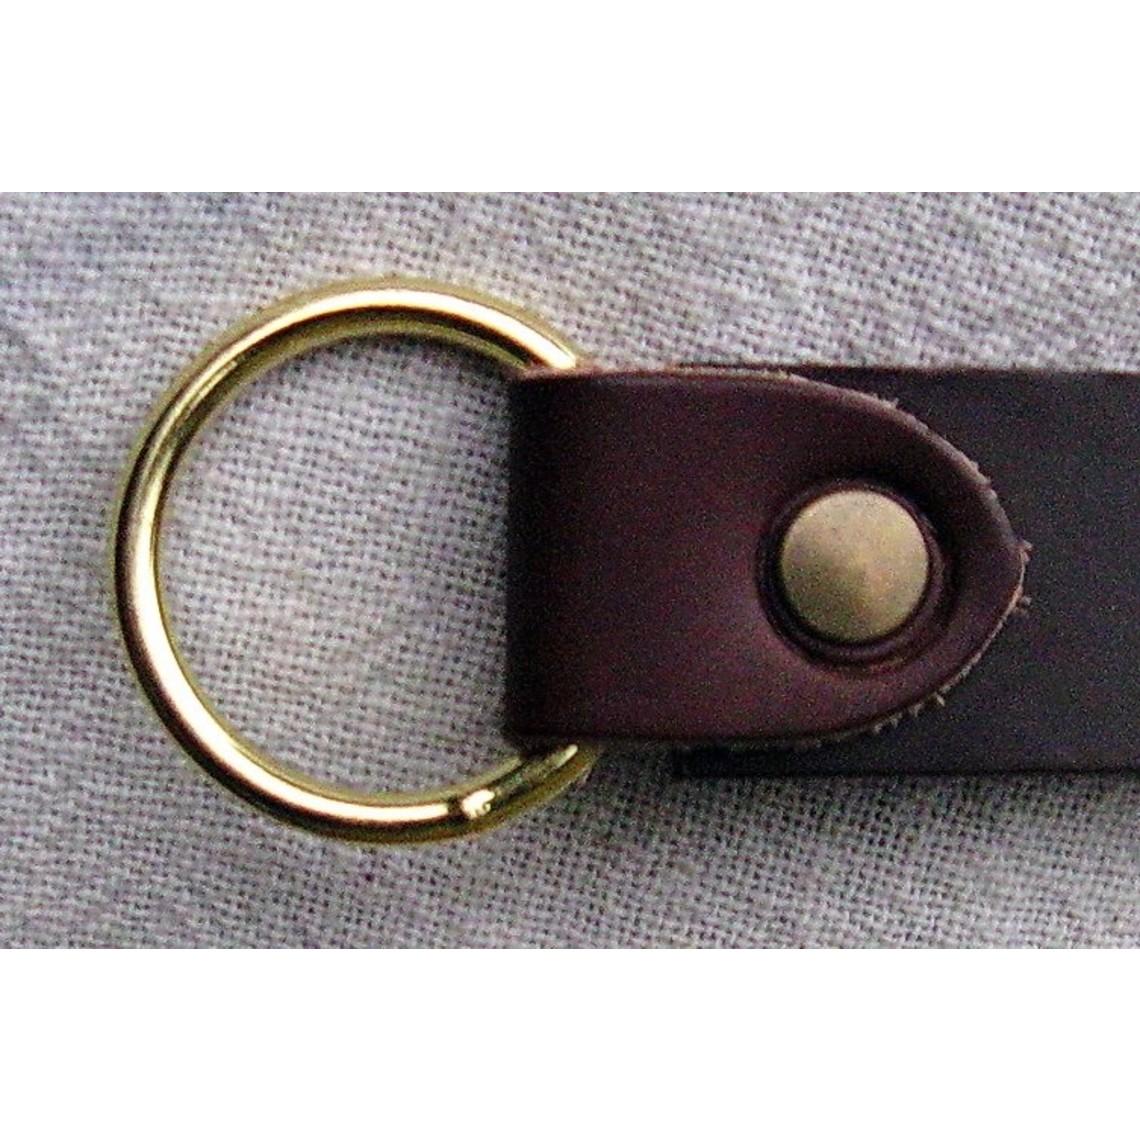 Leather ring belt 4 cm, brown split leather